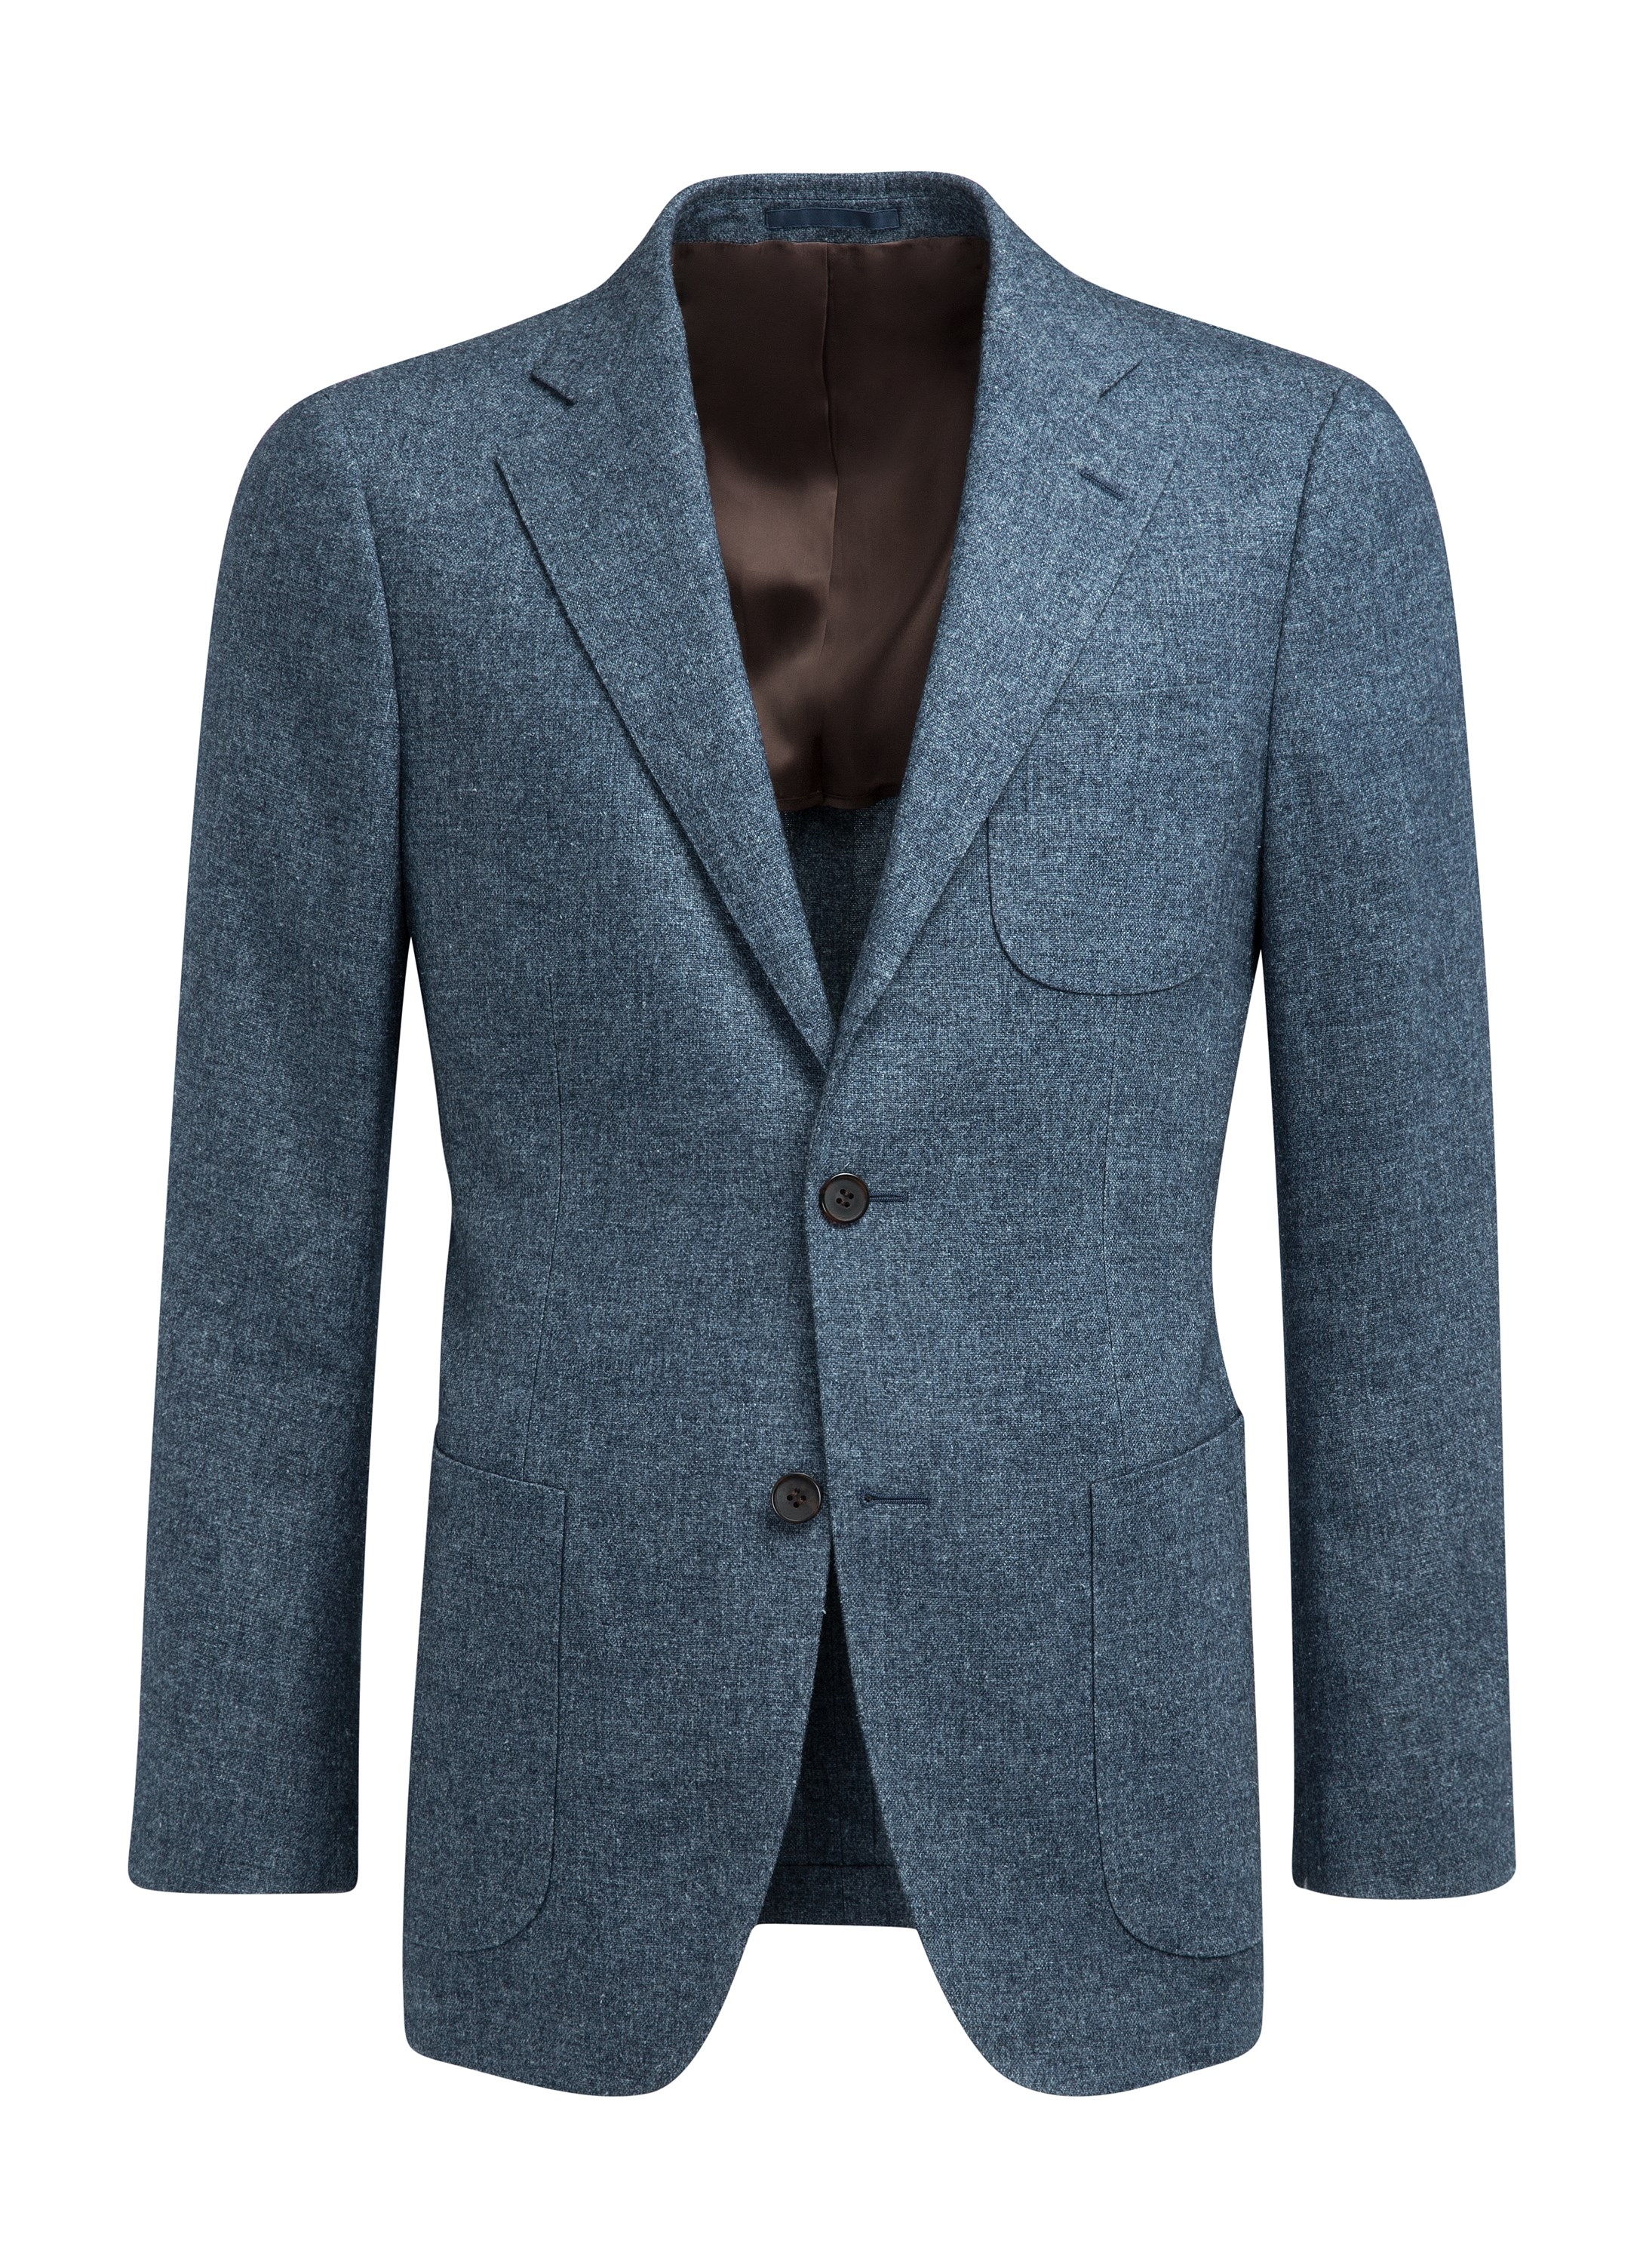 Jackets_Blue_Plain_Hudson_C928_Suitsupply_Online_Store_5.jpg